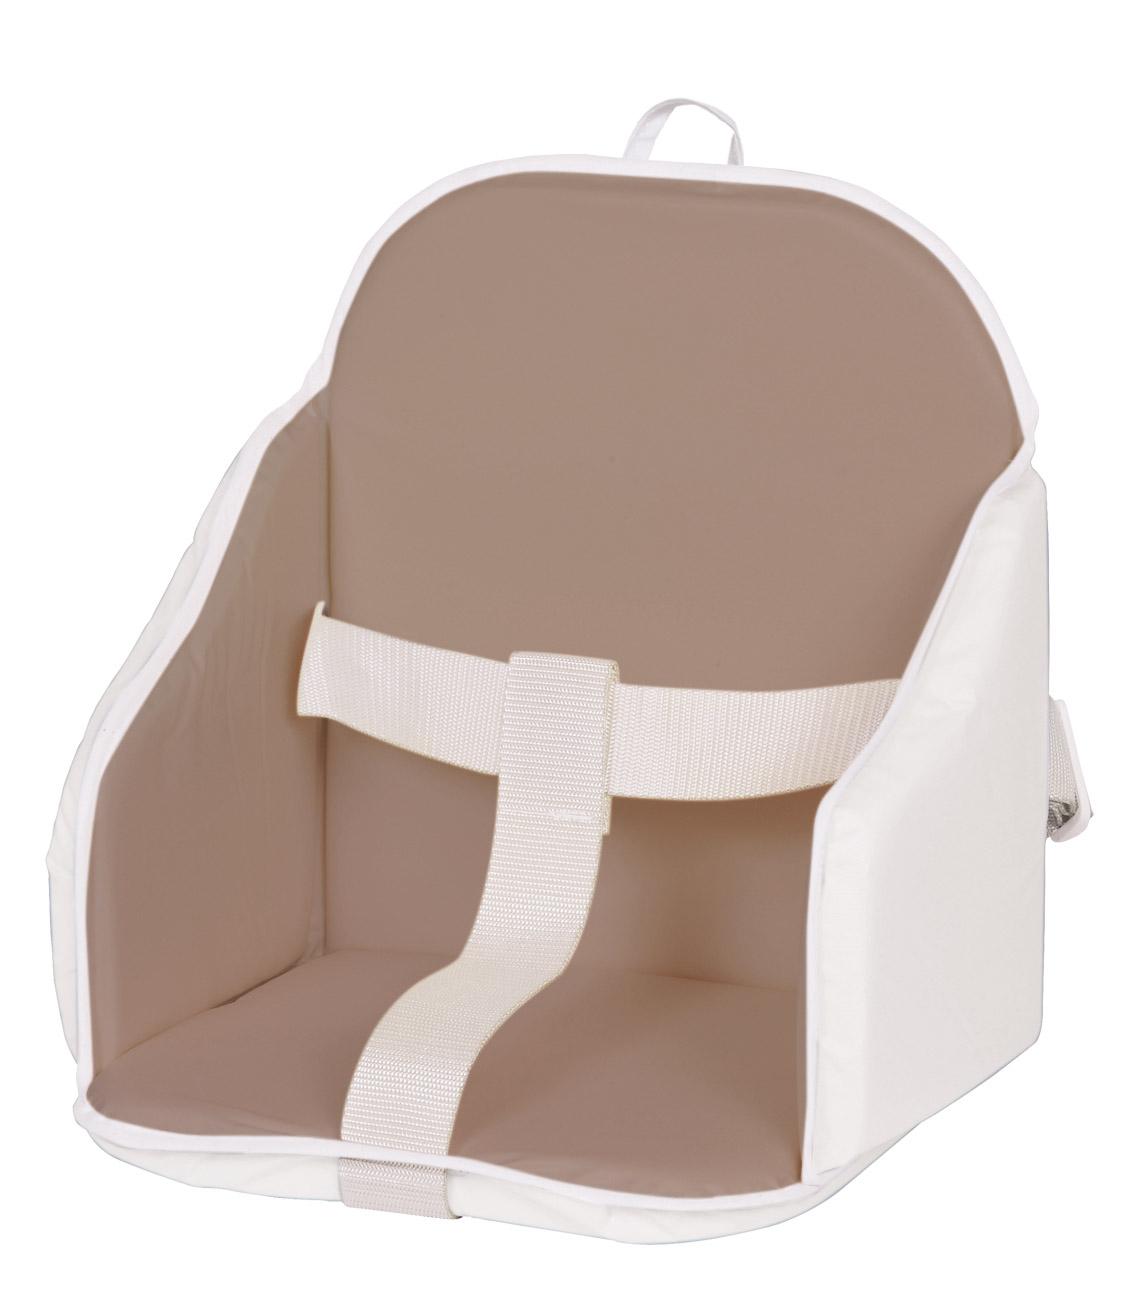 coussin de chaise pvc taupe blanc candide. Black Bedroom Furniture Sets. Home Design Ideas